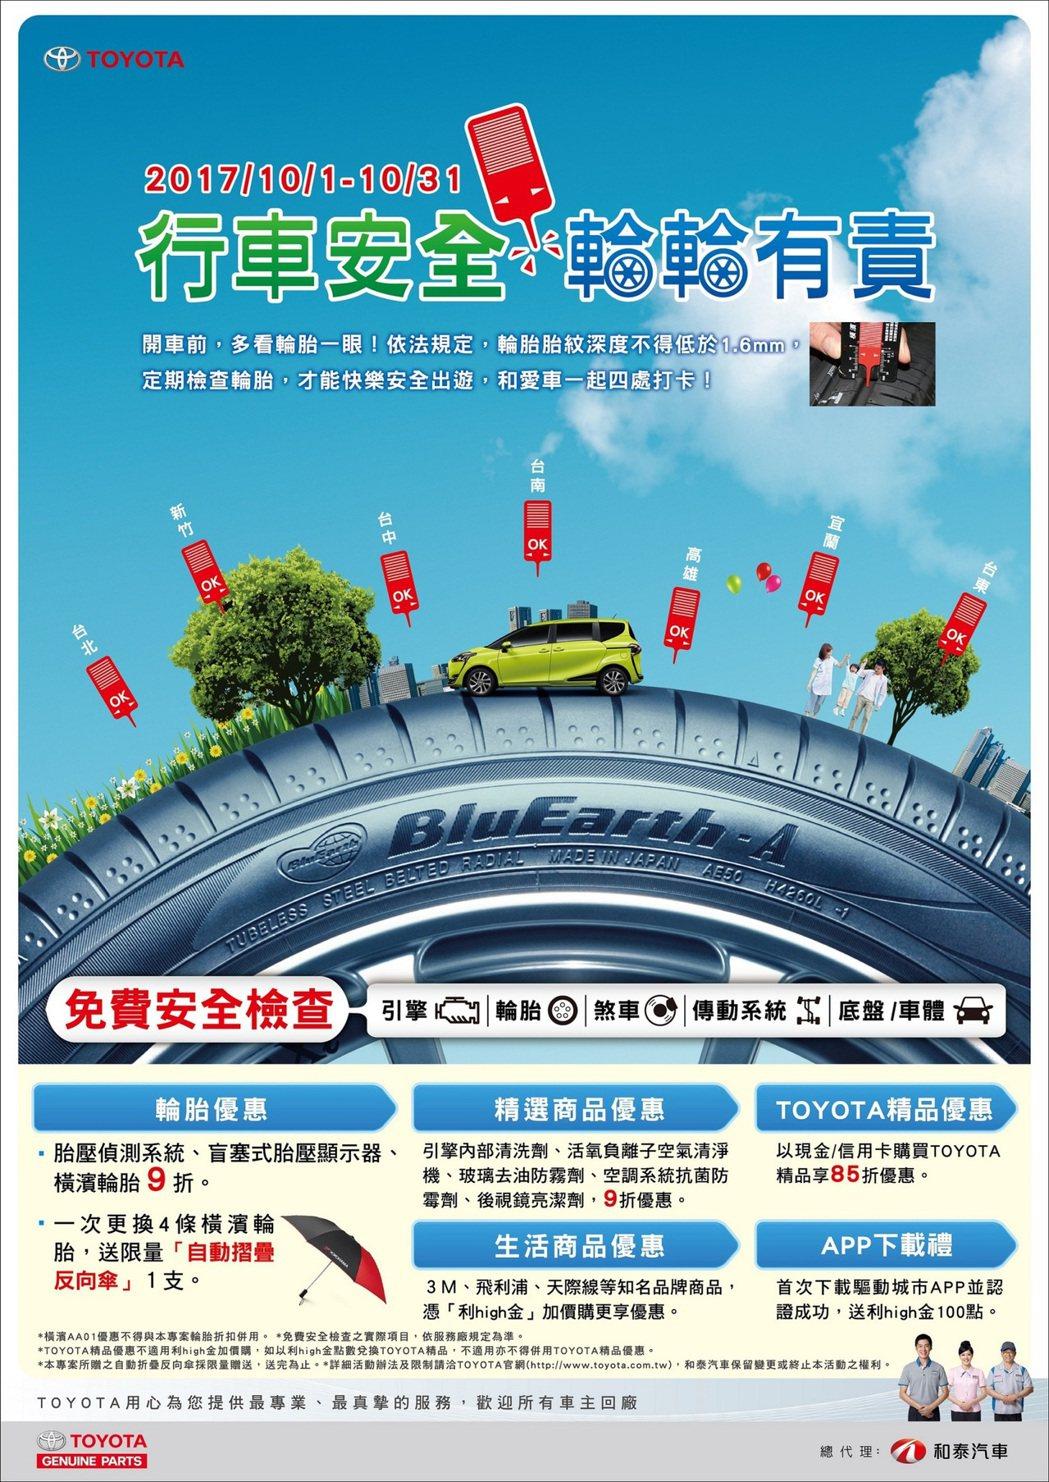 TOYOTA台灣總代理和泰汽車自即日起至10月31日,舉辦「TOYOTA秋季健診...